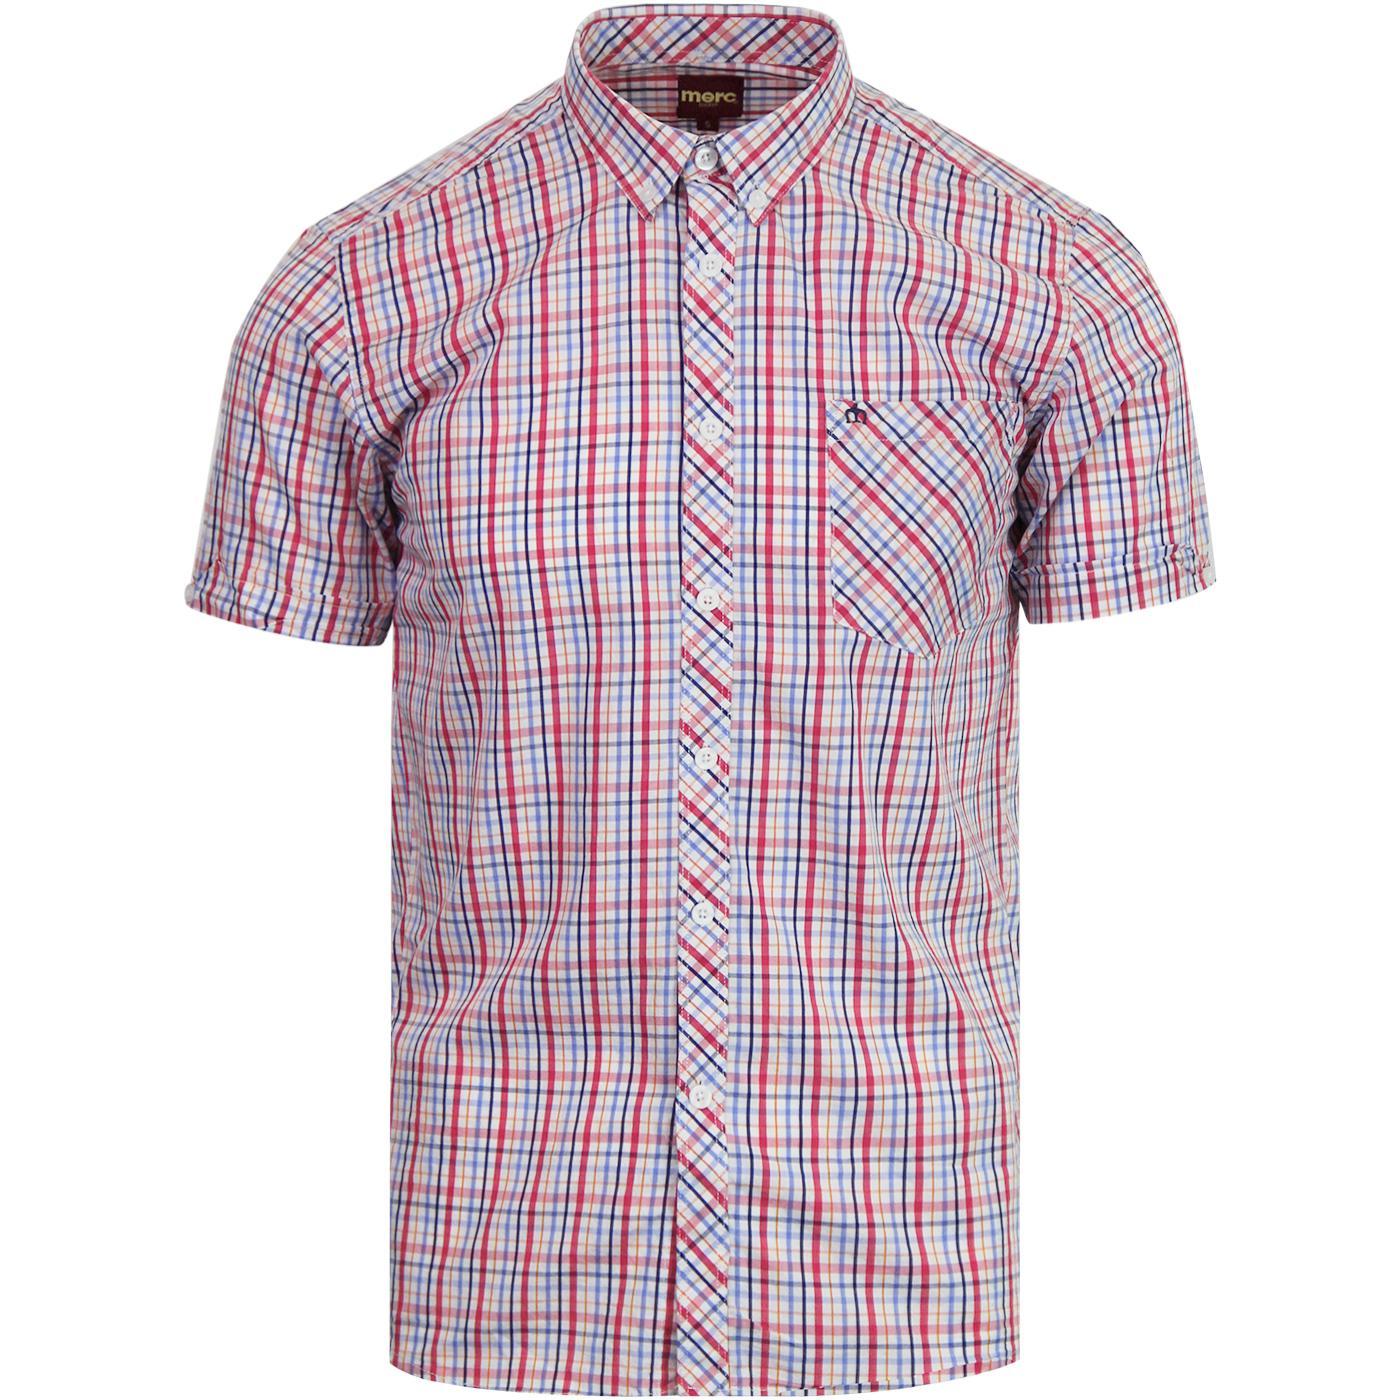 Ridley MERC Retro Mod Multi Check S/S Shirt RED